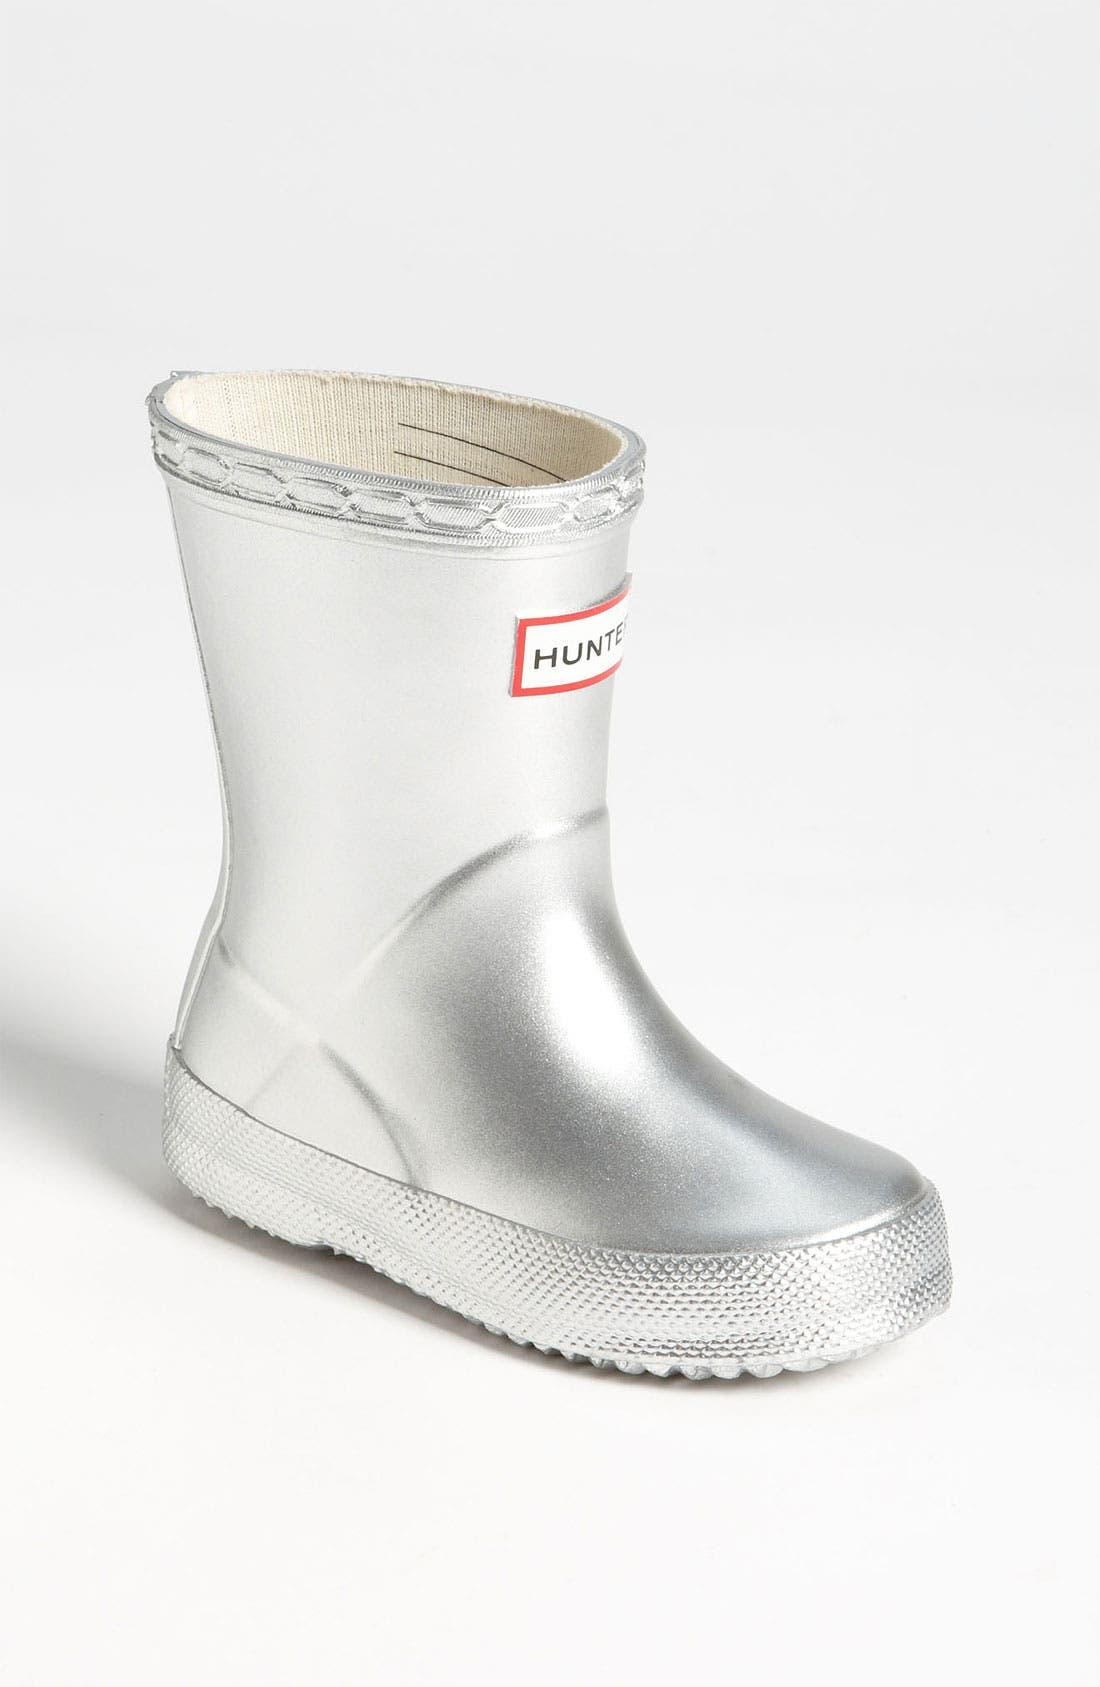 Main Image - Hunter 'Kid's First Gloss' Rain Boot (Walker & Toddler)